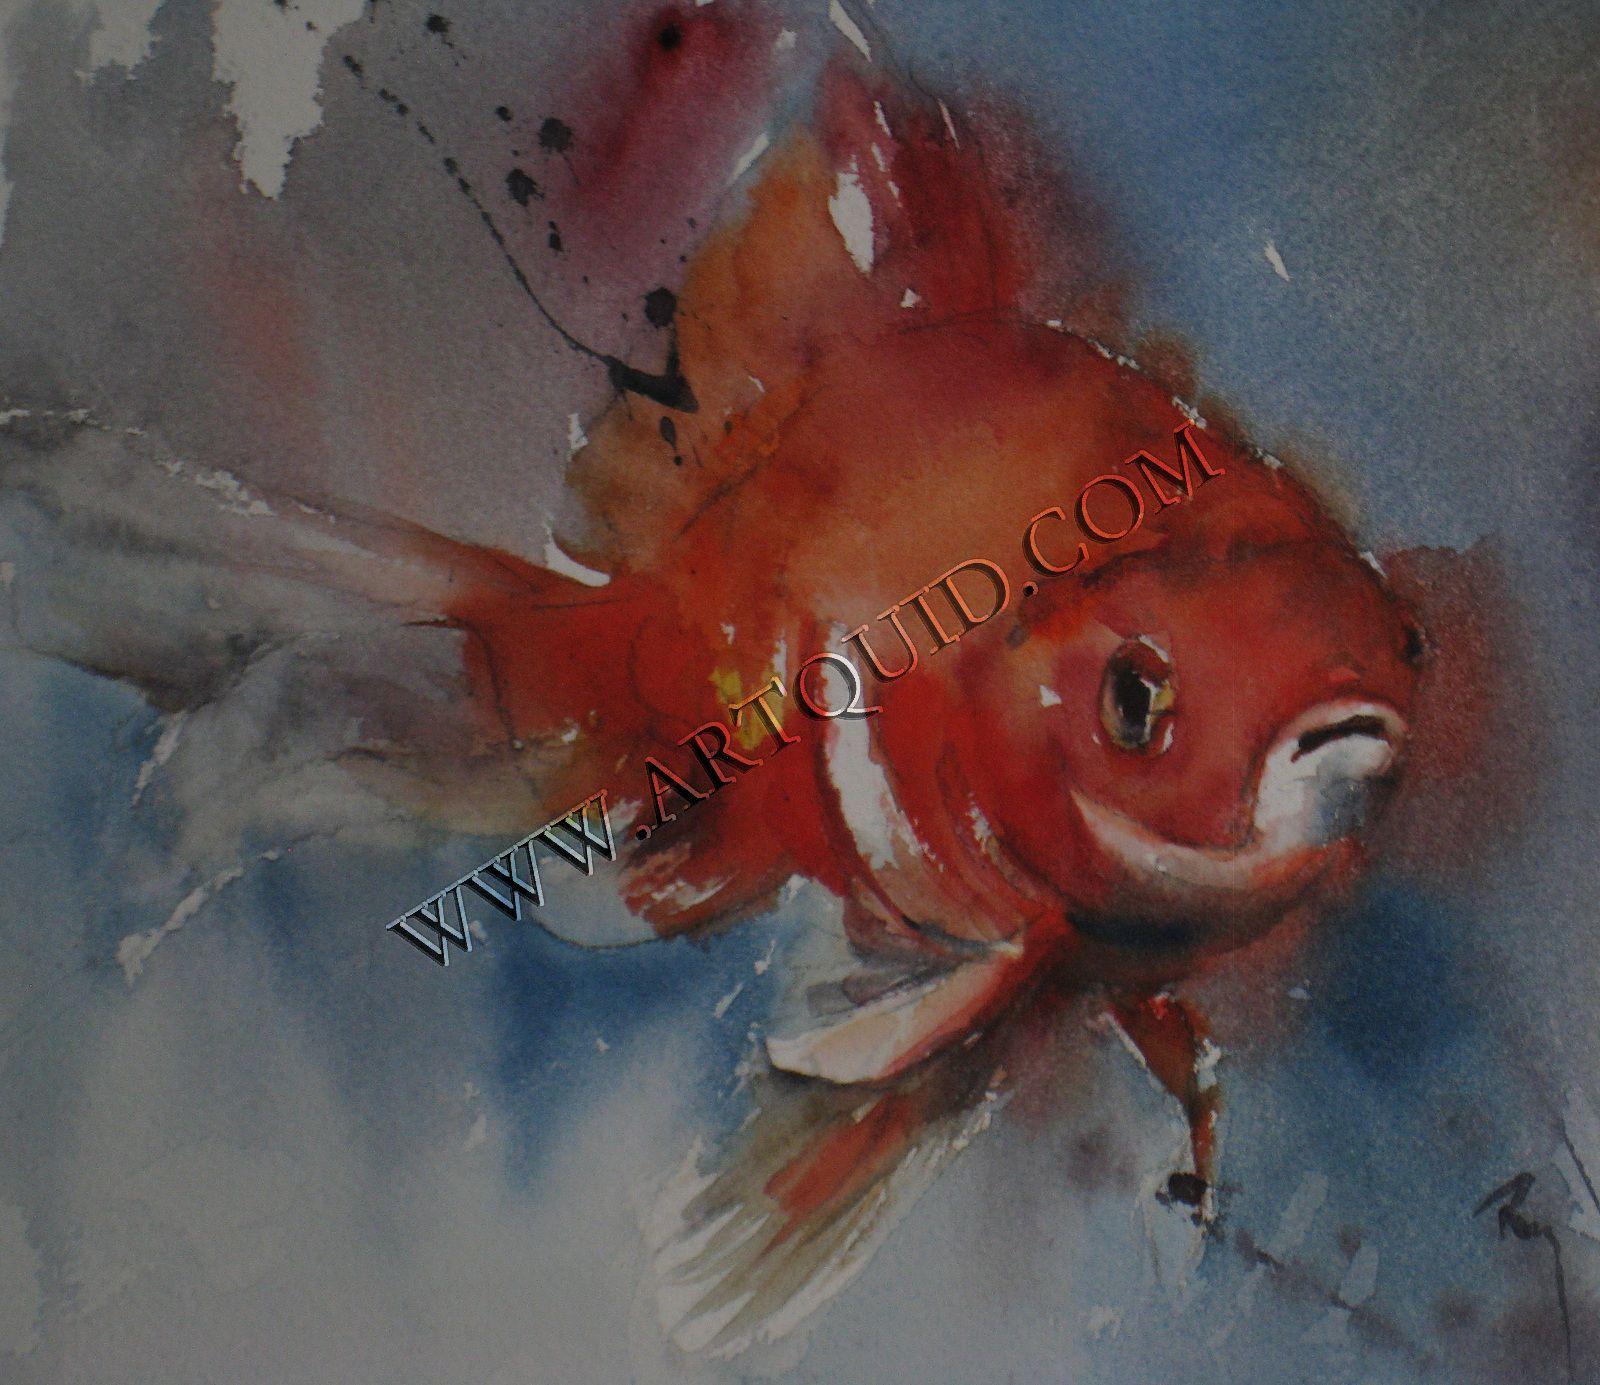 378358.1204395536.1.1600m.jpg (1600×1385) | Watercolour | Pinterest ...